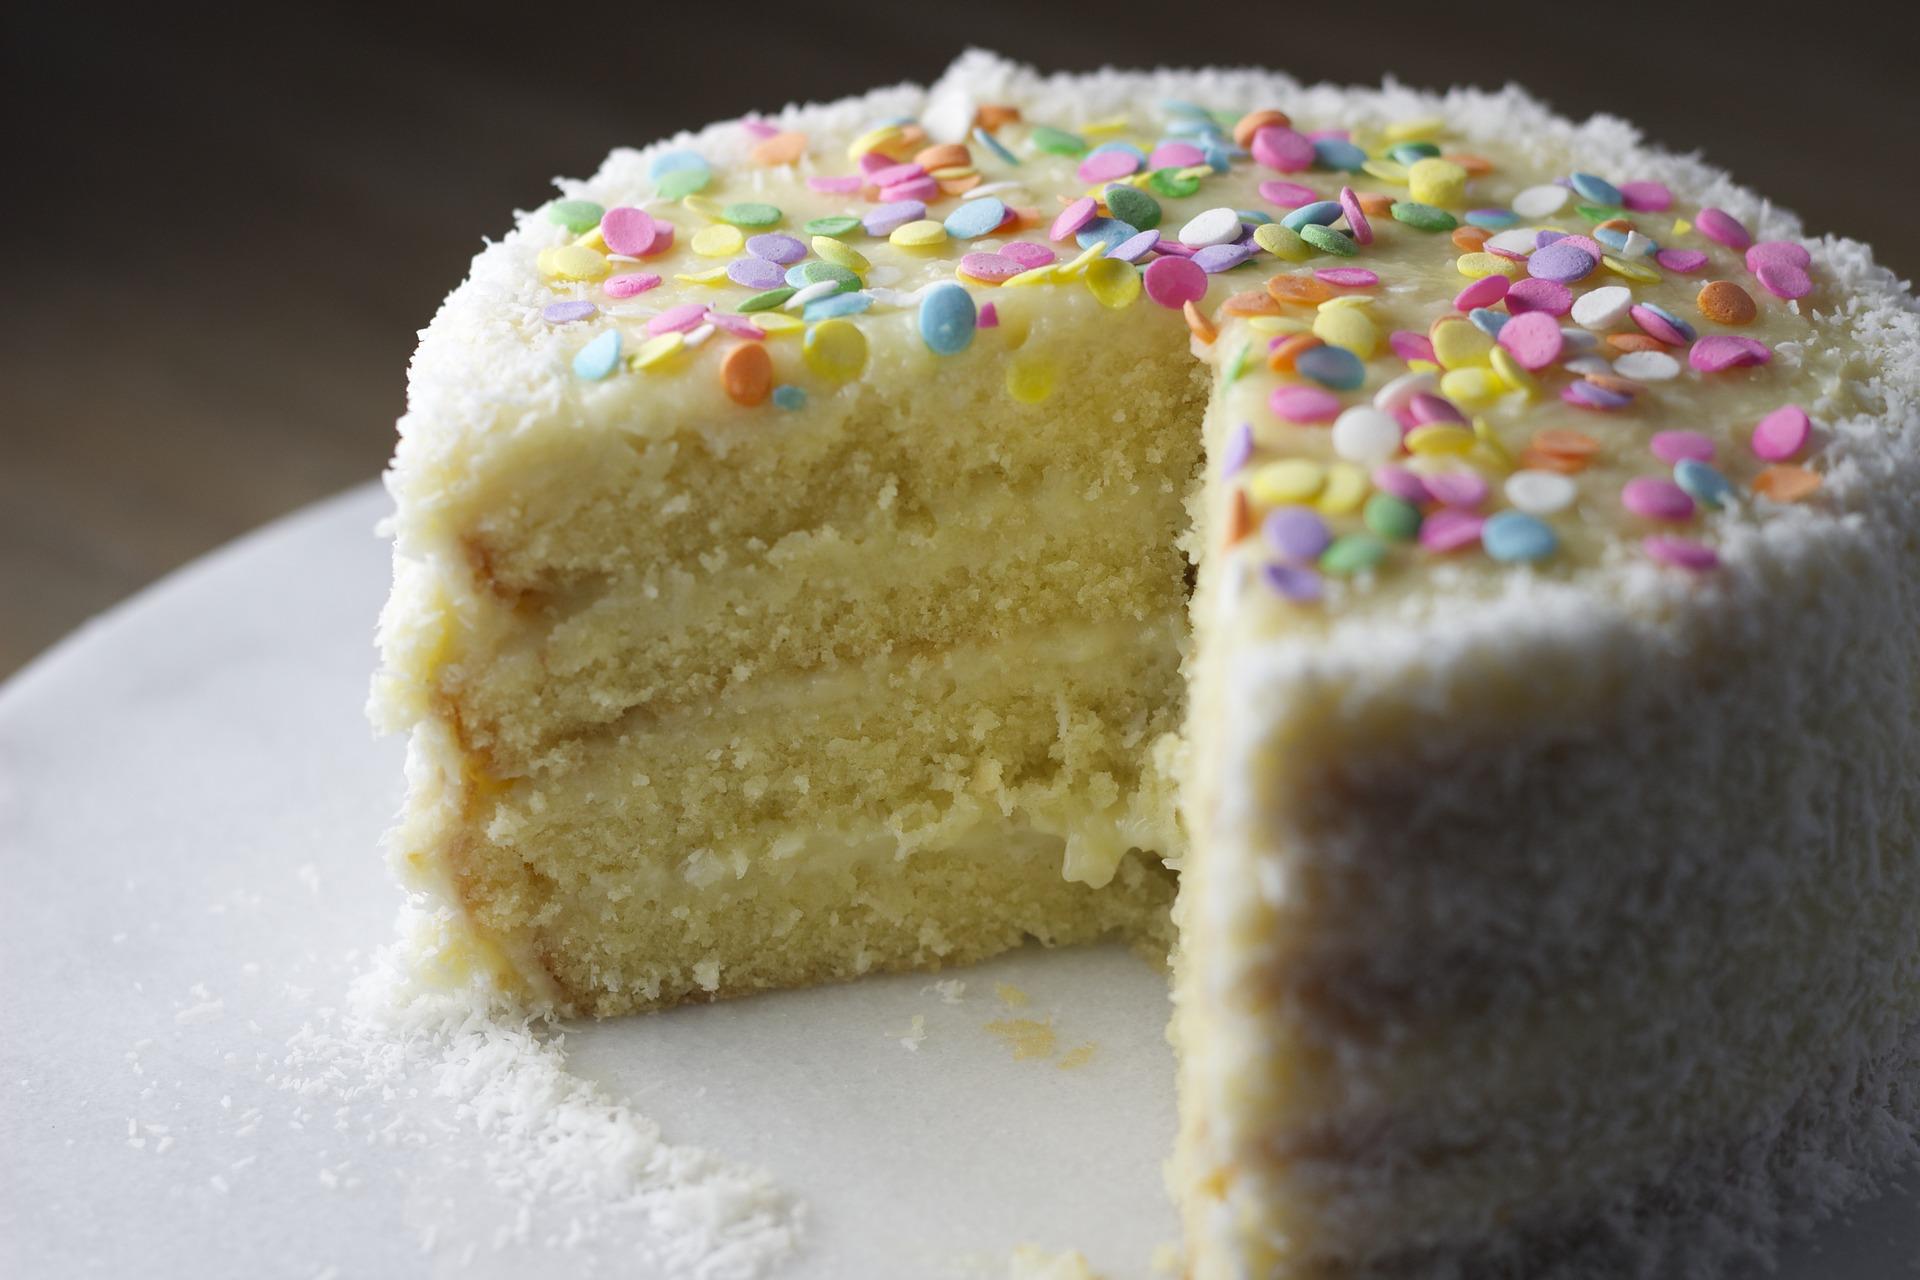 cake-727854_1920